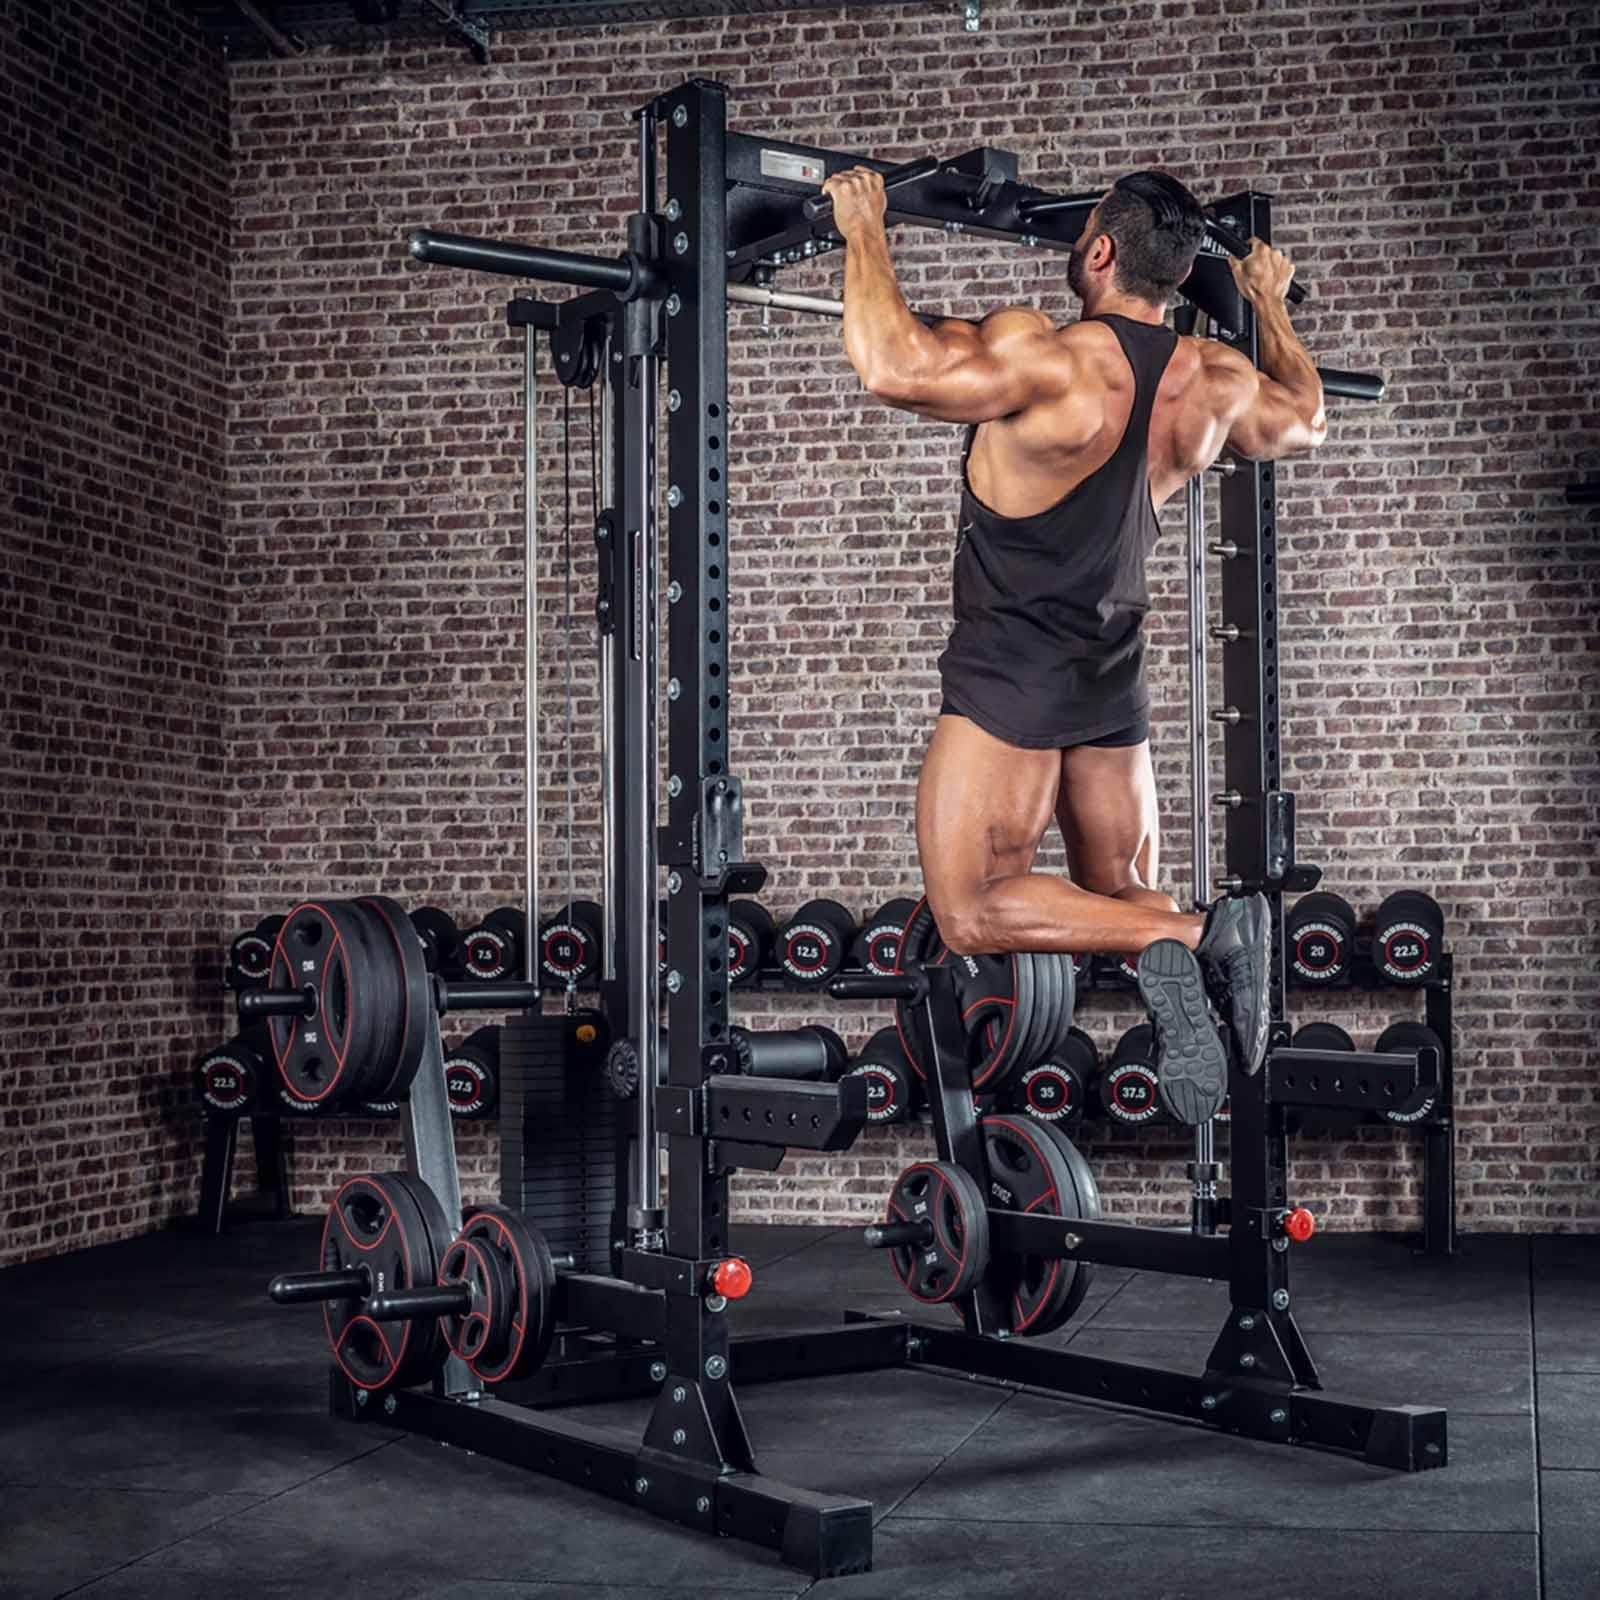 Smith machine half rack